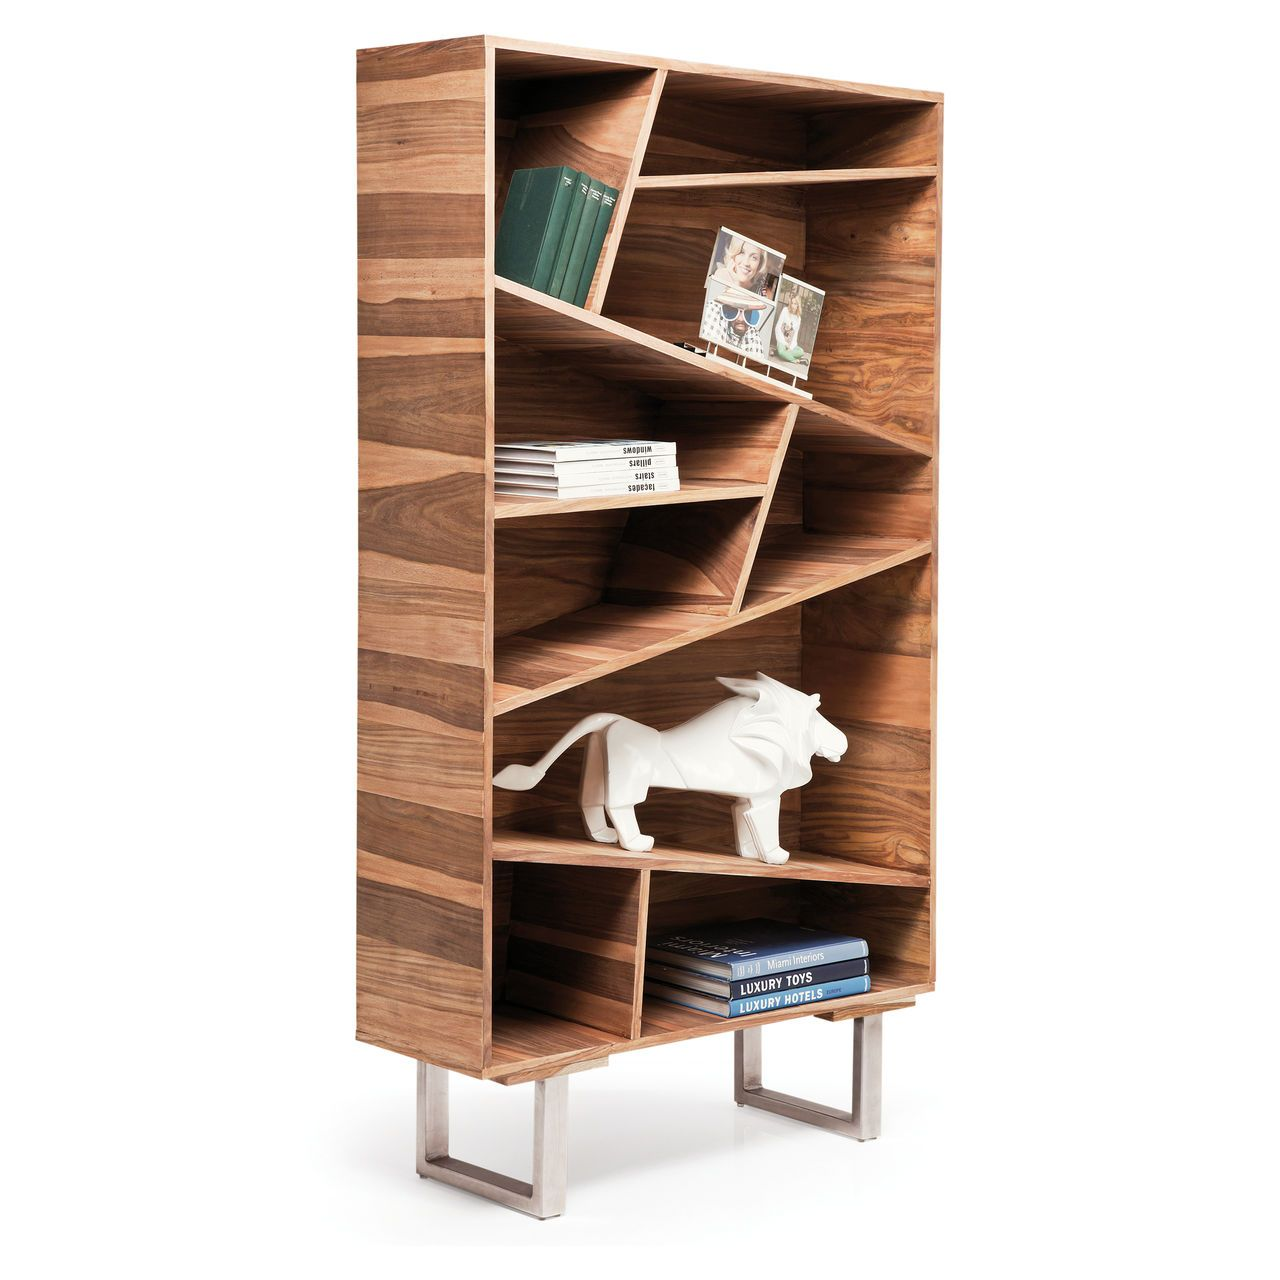 Mobelserie Chaos Mobel Holz Haus Deko Und Regal Design